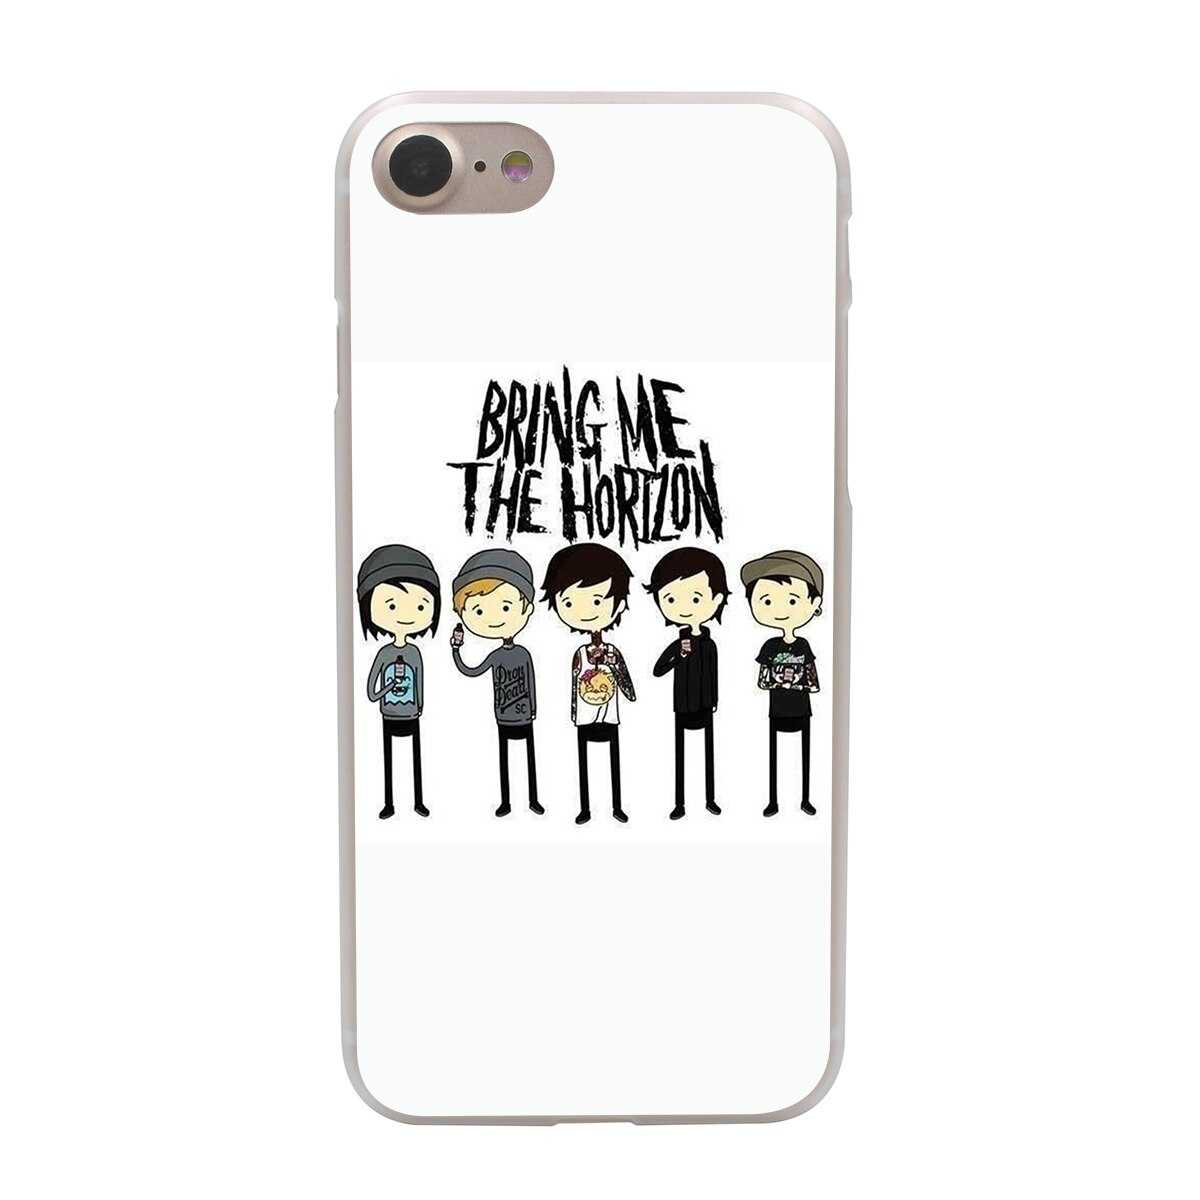 Bring Me the Horizon iPhone Case Color 123456789101112 18